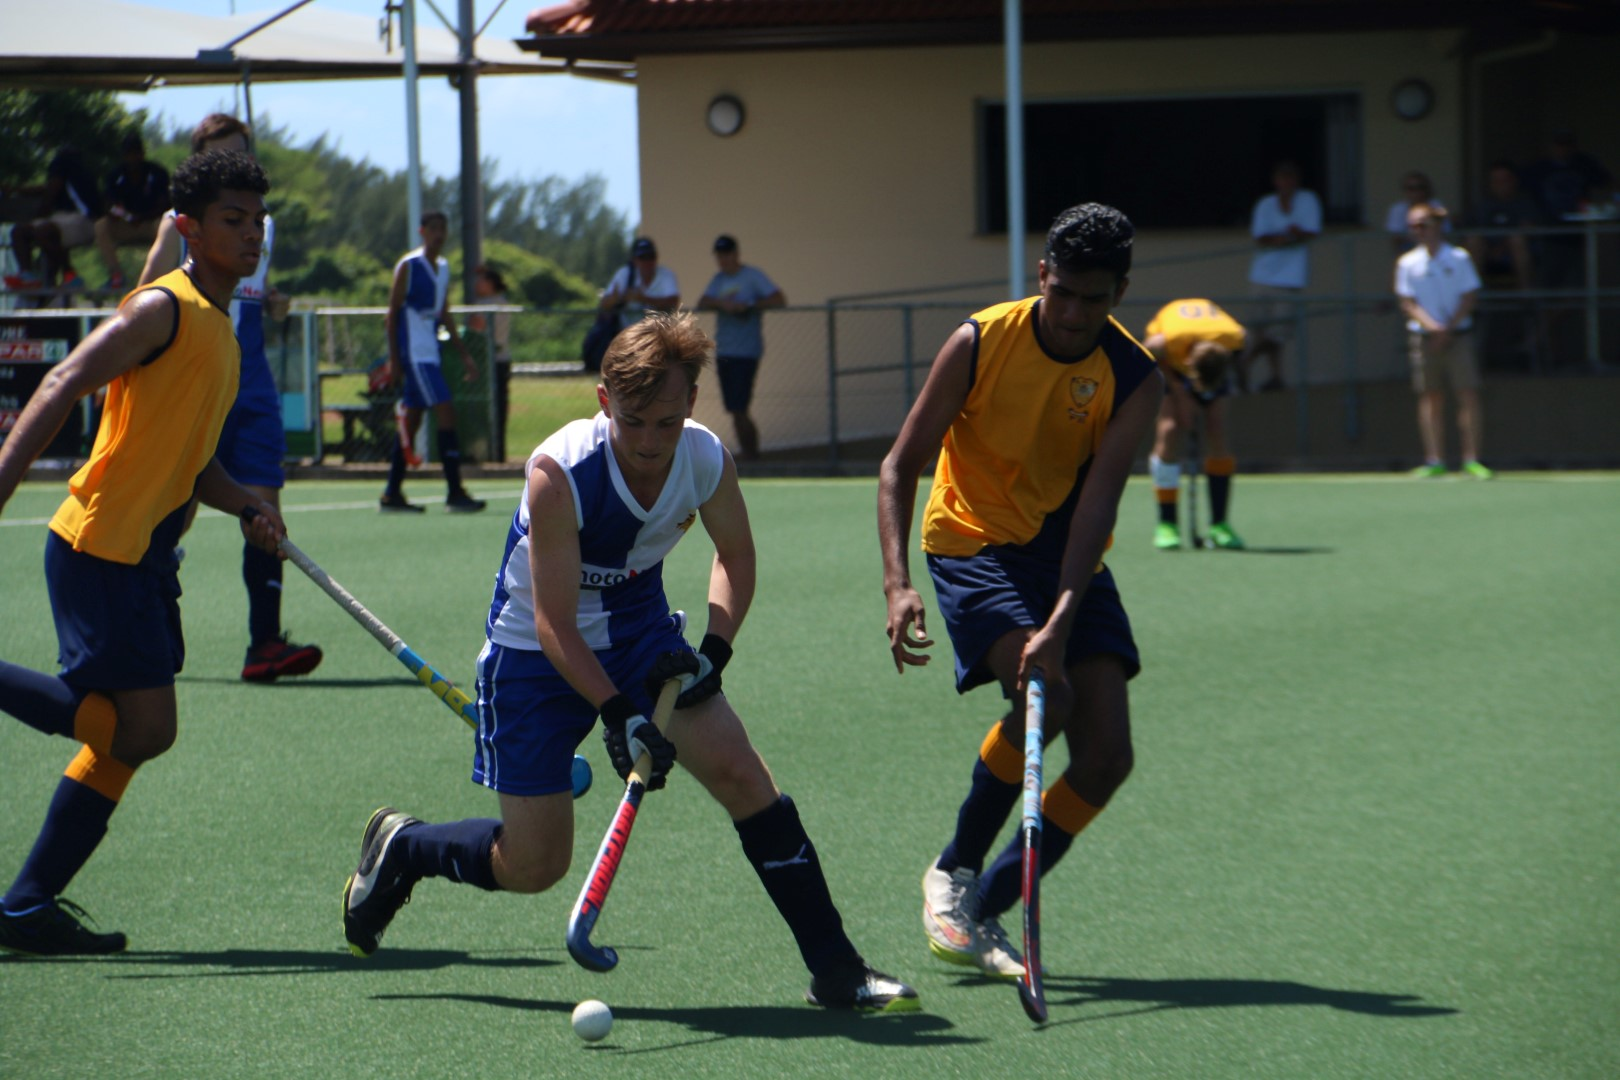 Northood School player Tyronne Laaks. PHOTO: Brian Gow